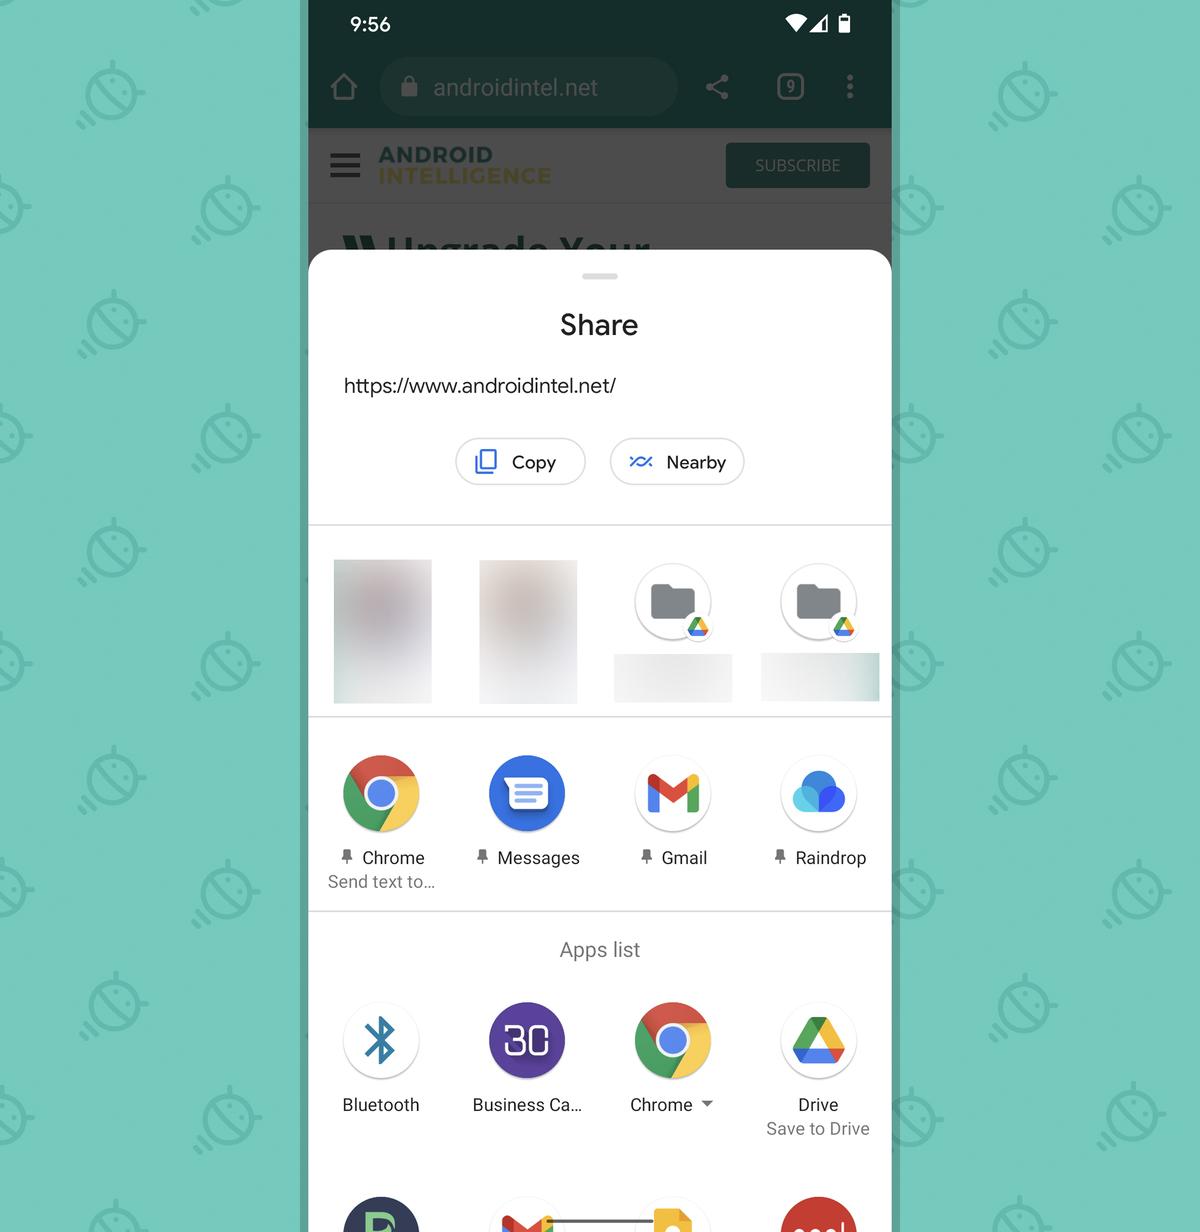 Chrome Android Sharing Settings: Standard share menu